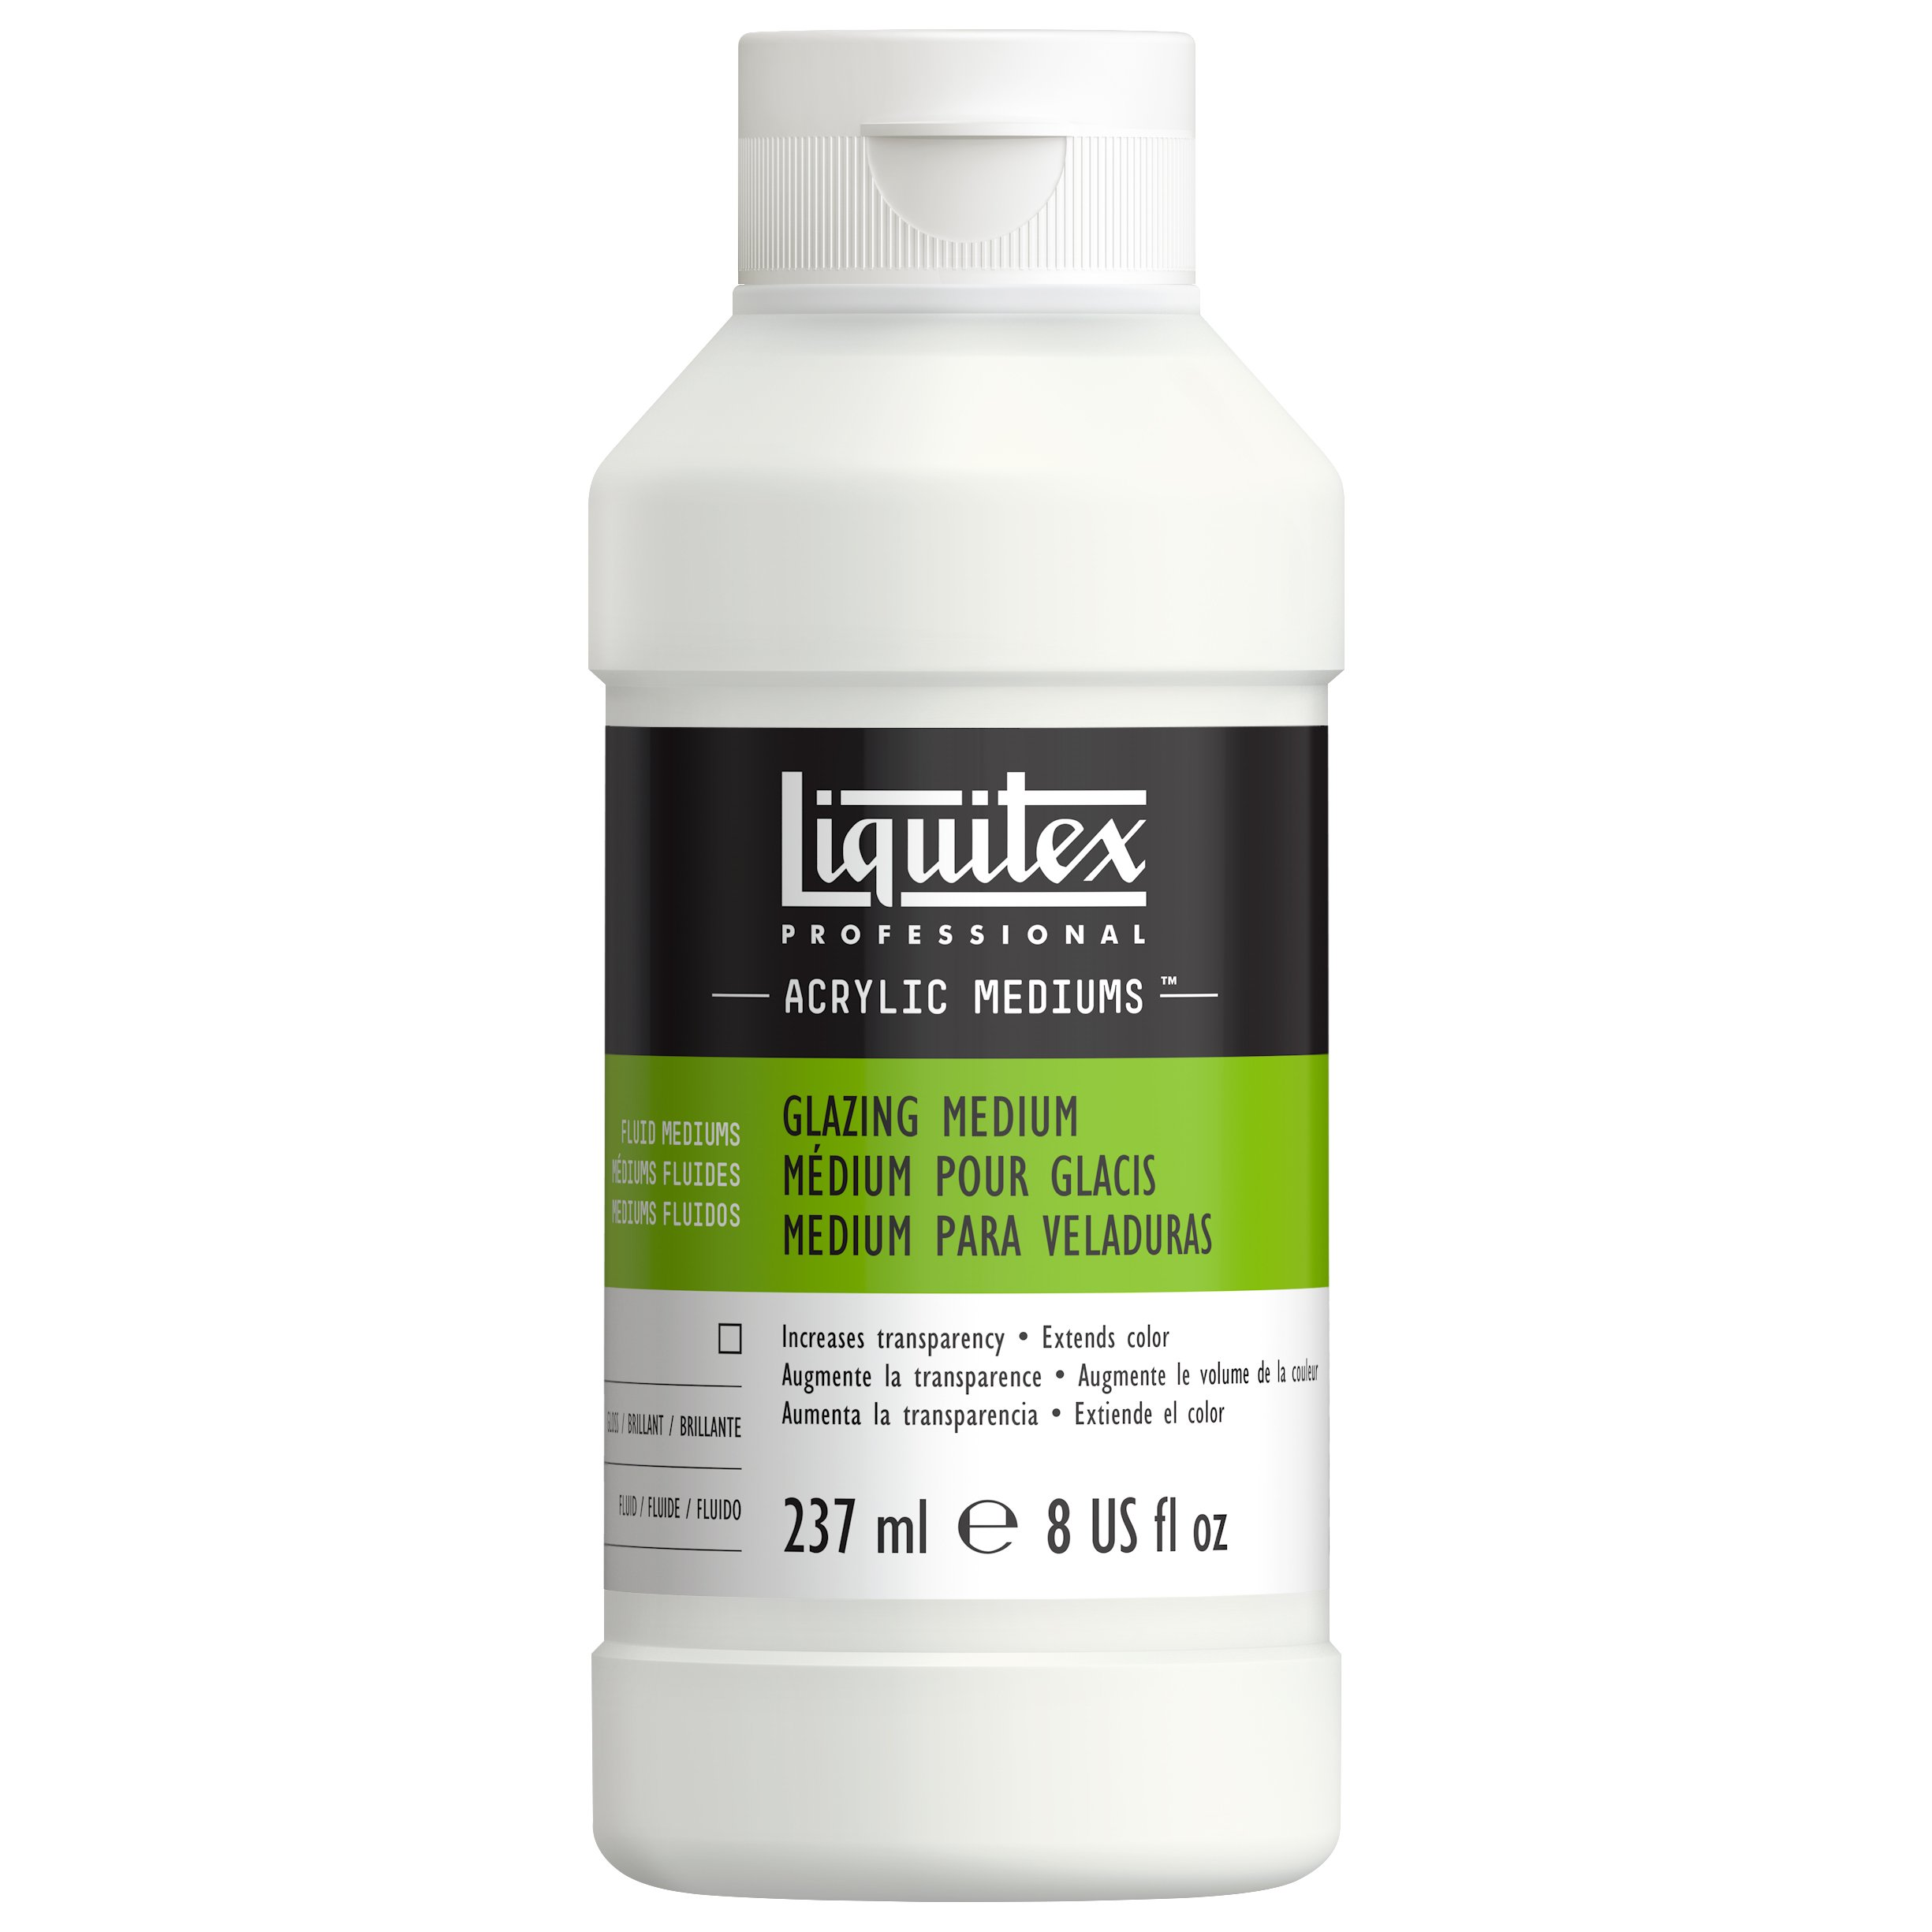 Liquitex Professional Glazing Fluid Medium 237ml